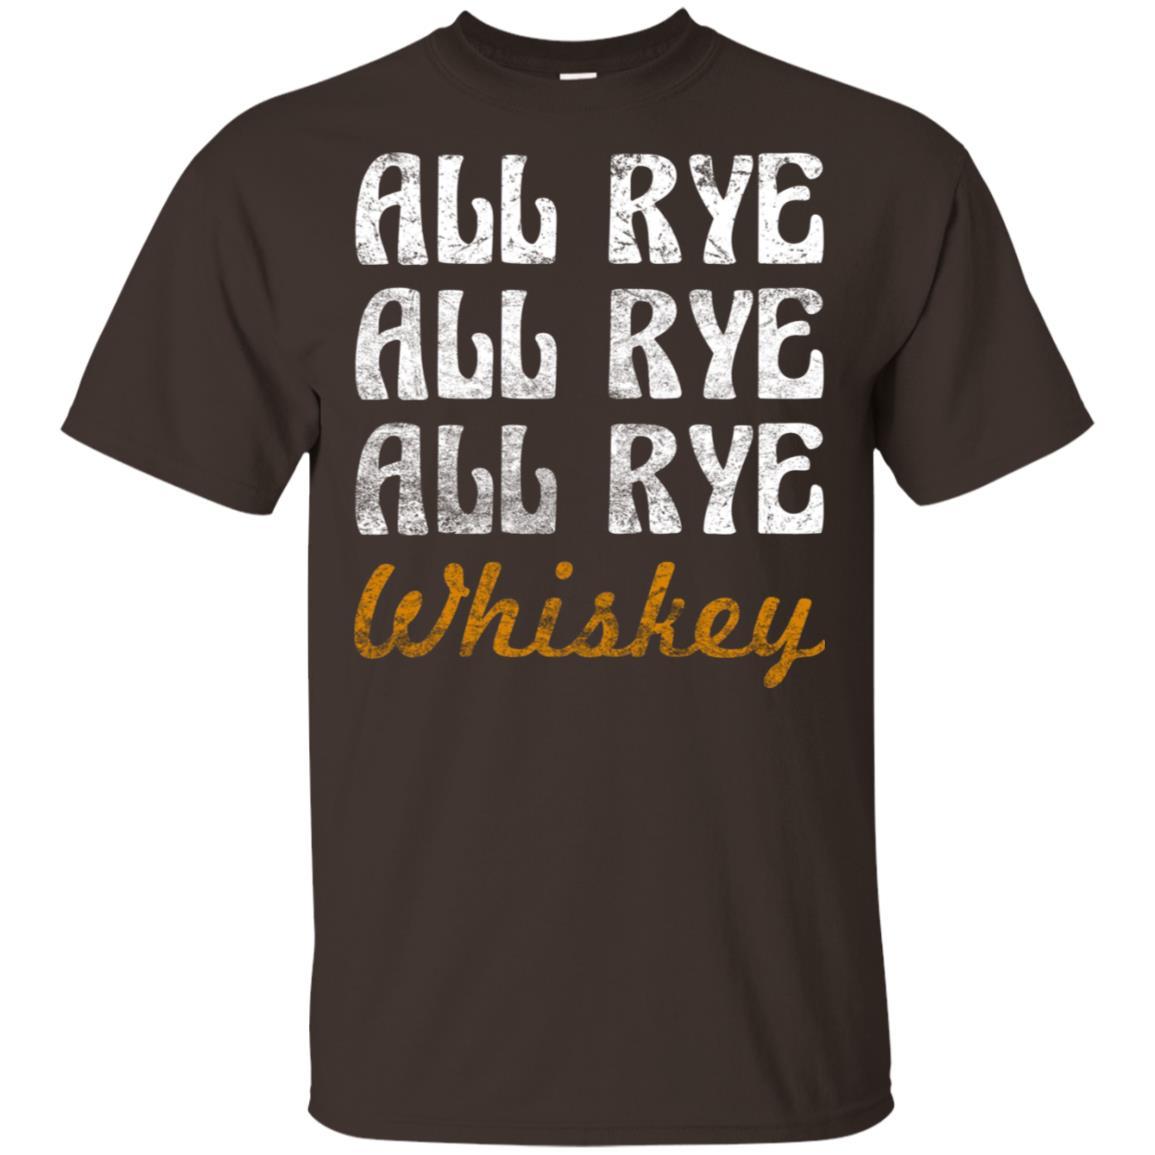 Whiskey, All Rye All Rye All Rye, Whiskey Unisex Short Sleeve